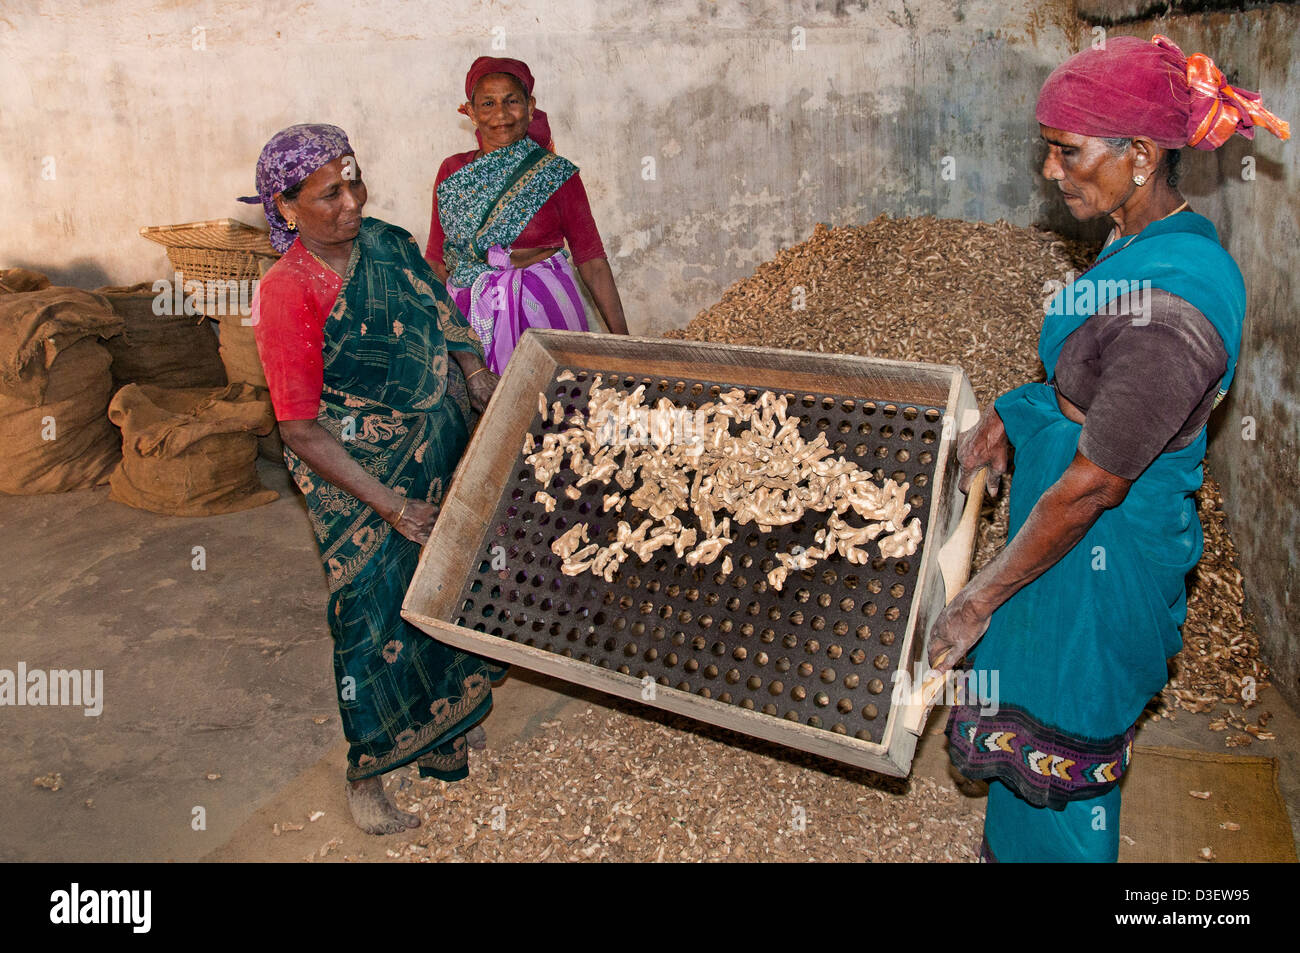 Woman Sieve Sieving Ginger Root Kochi Cochin Kerala India - Stock Image